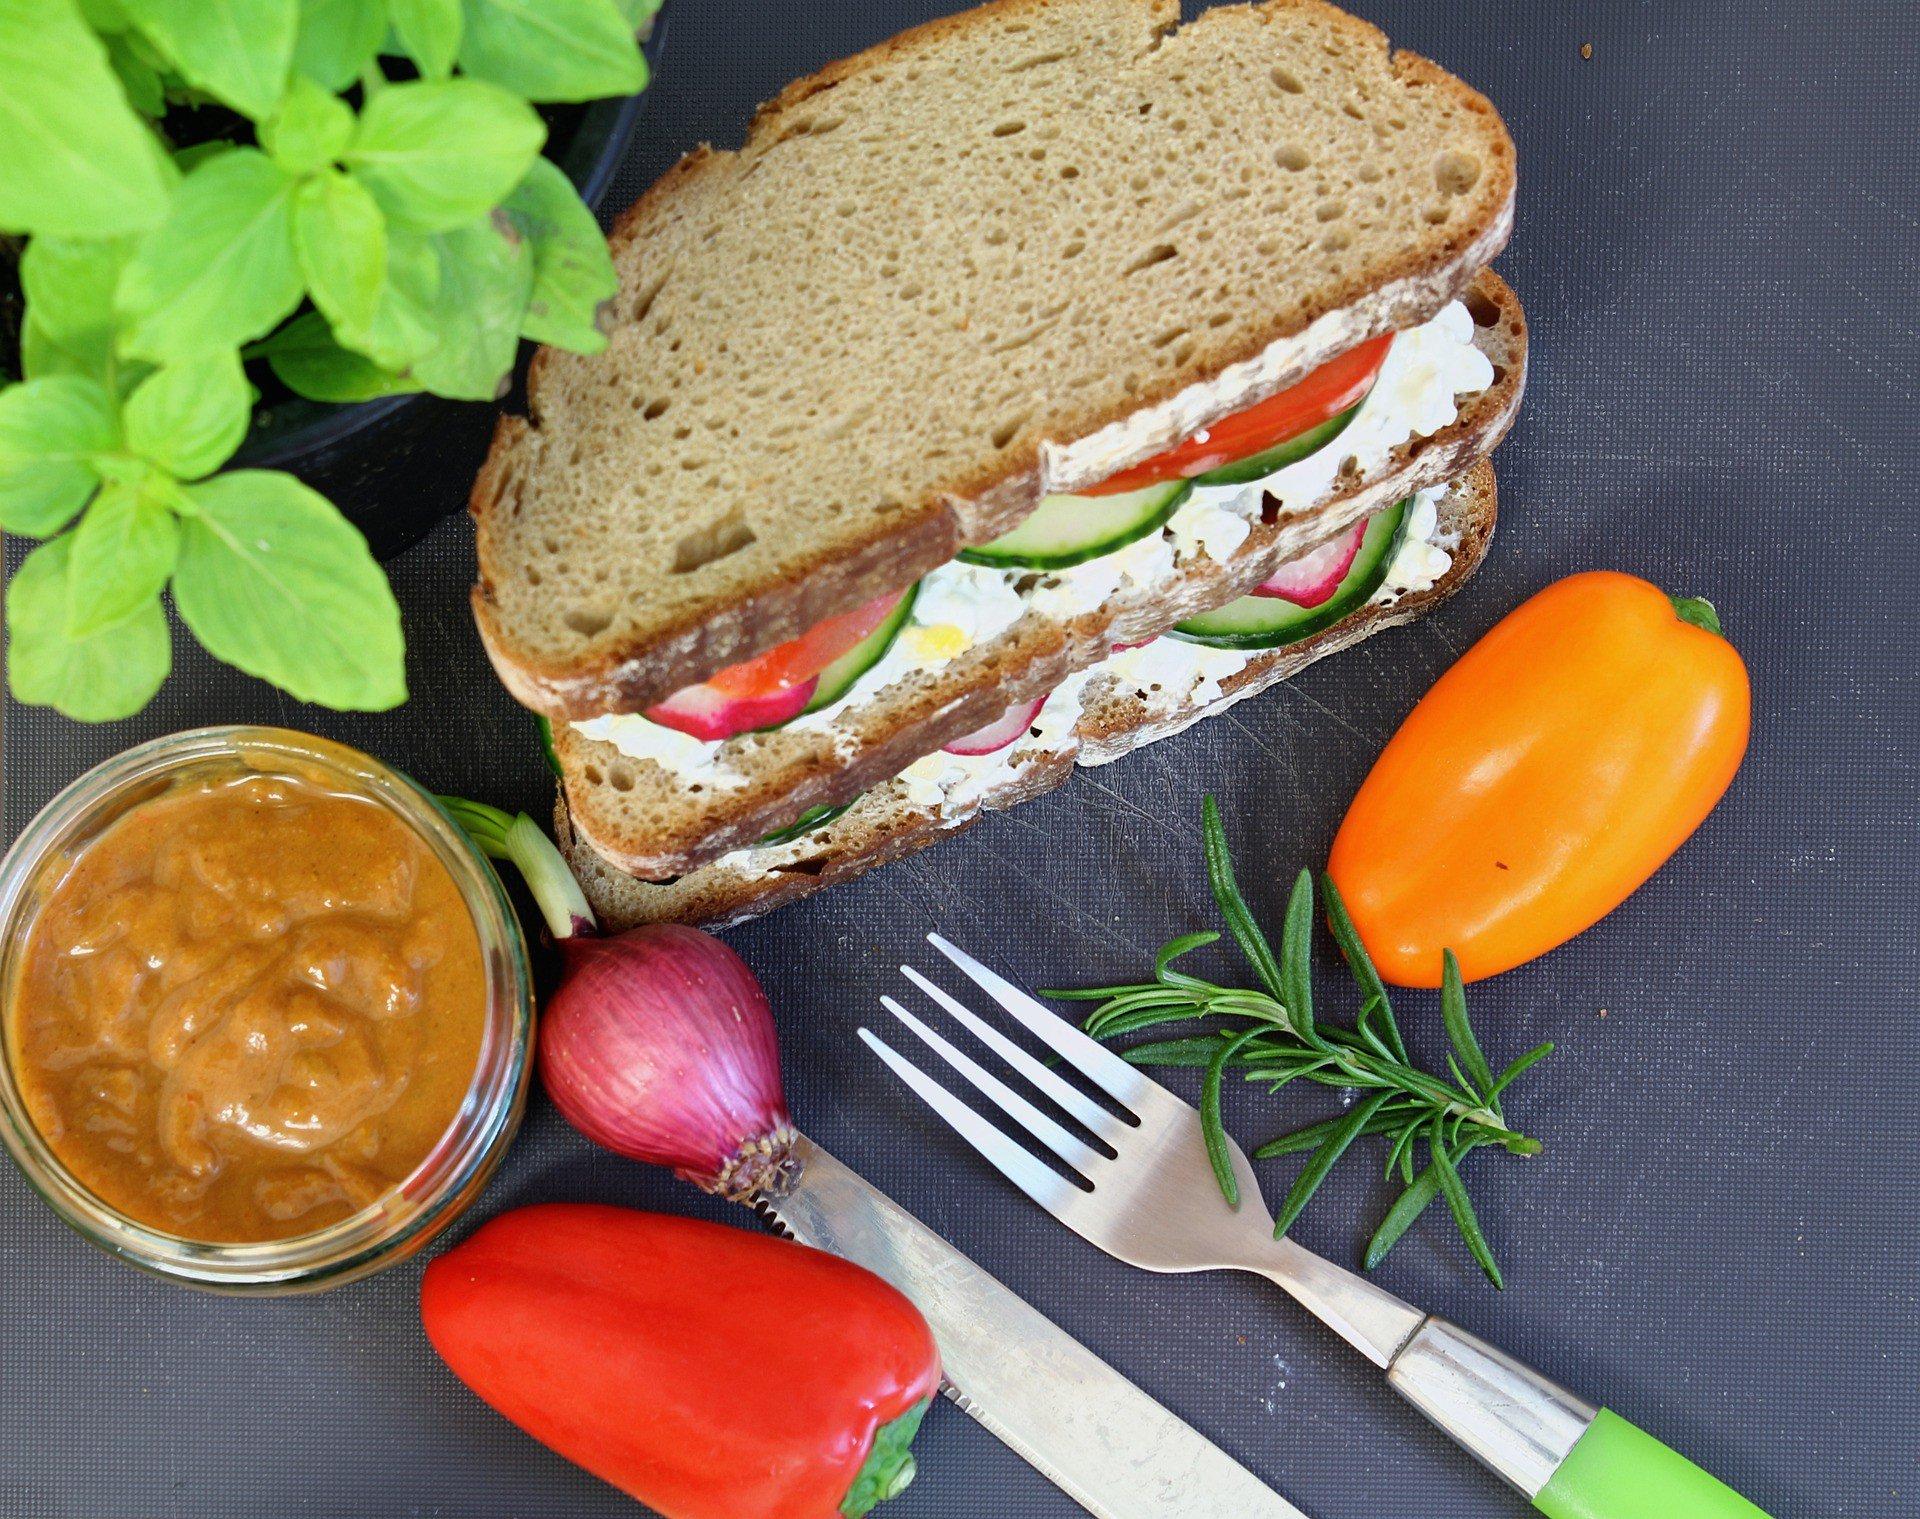 sandwich 5270231 1920